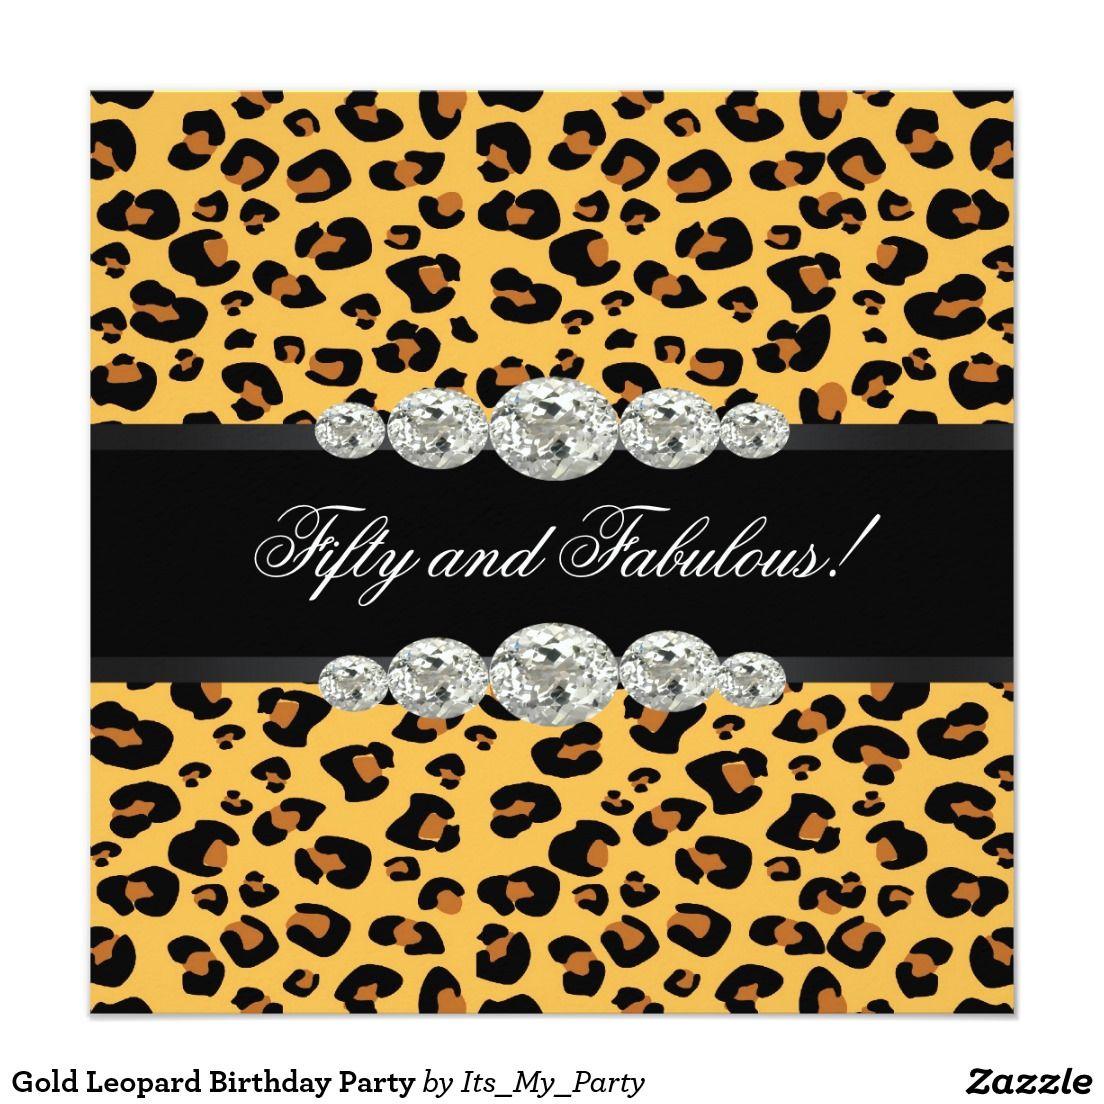 Gold Leopard Birthday Party Card | Leopard birthday parties, Leopard ...